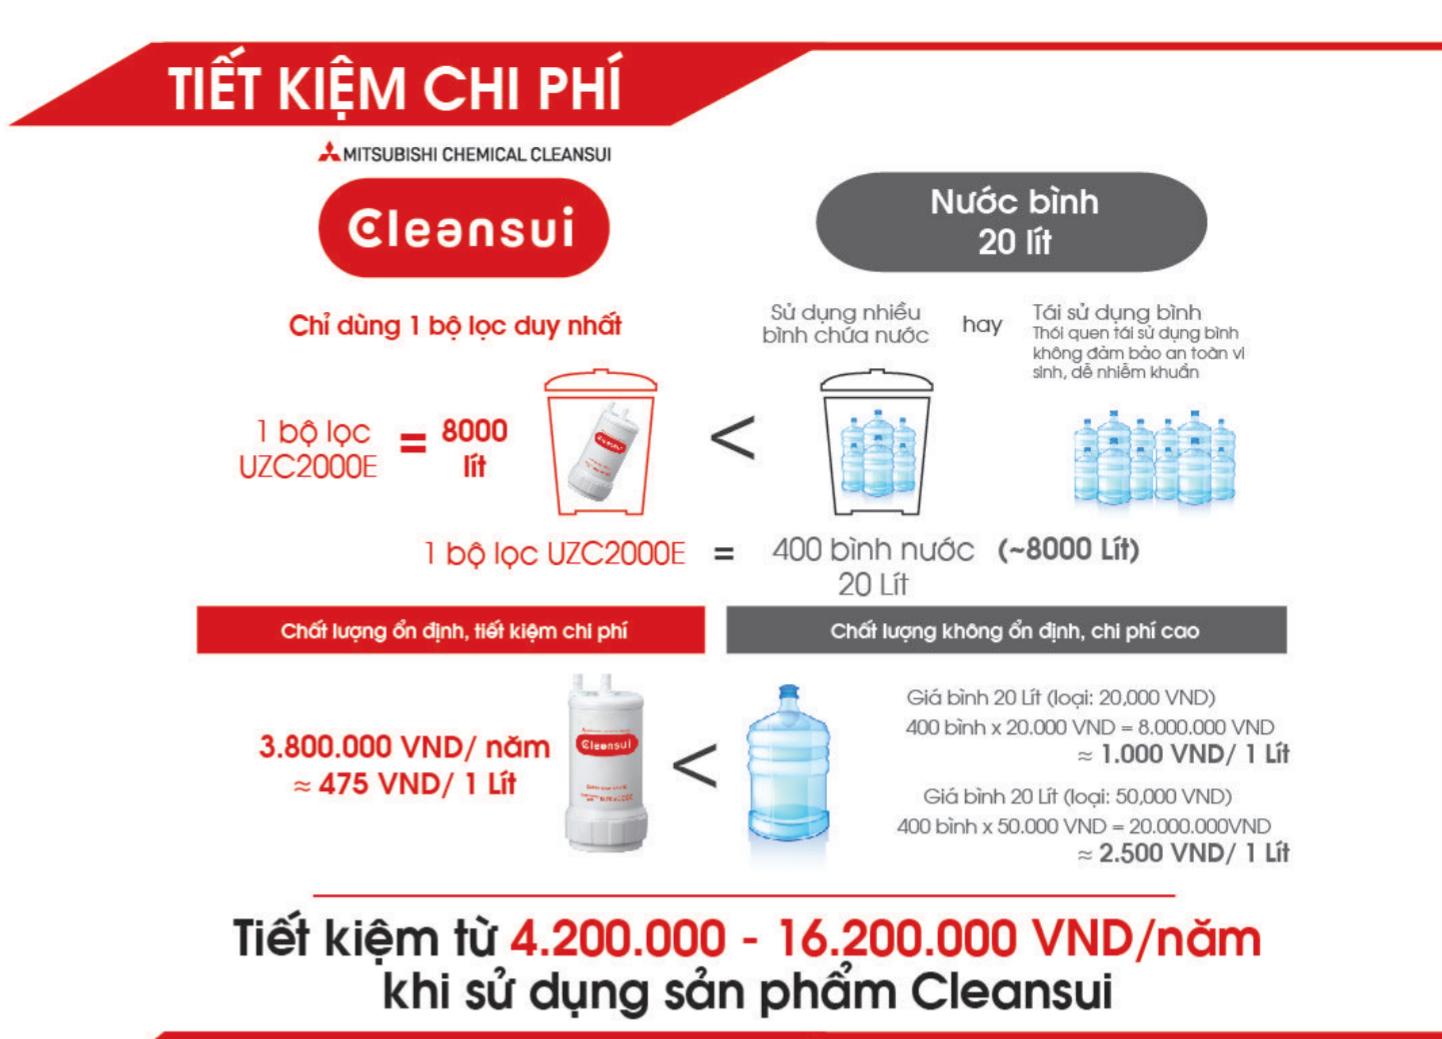 thiết bị lọc nước A101E/EU101 từ Mitsubishi Cleansui